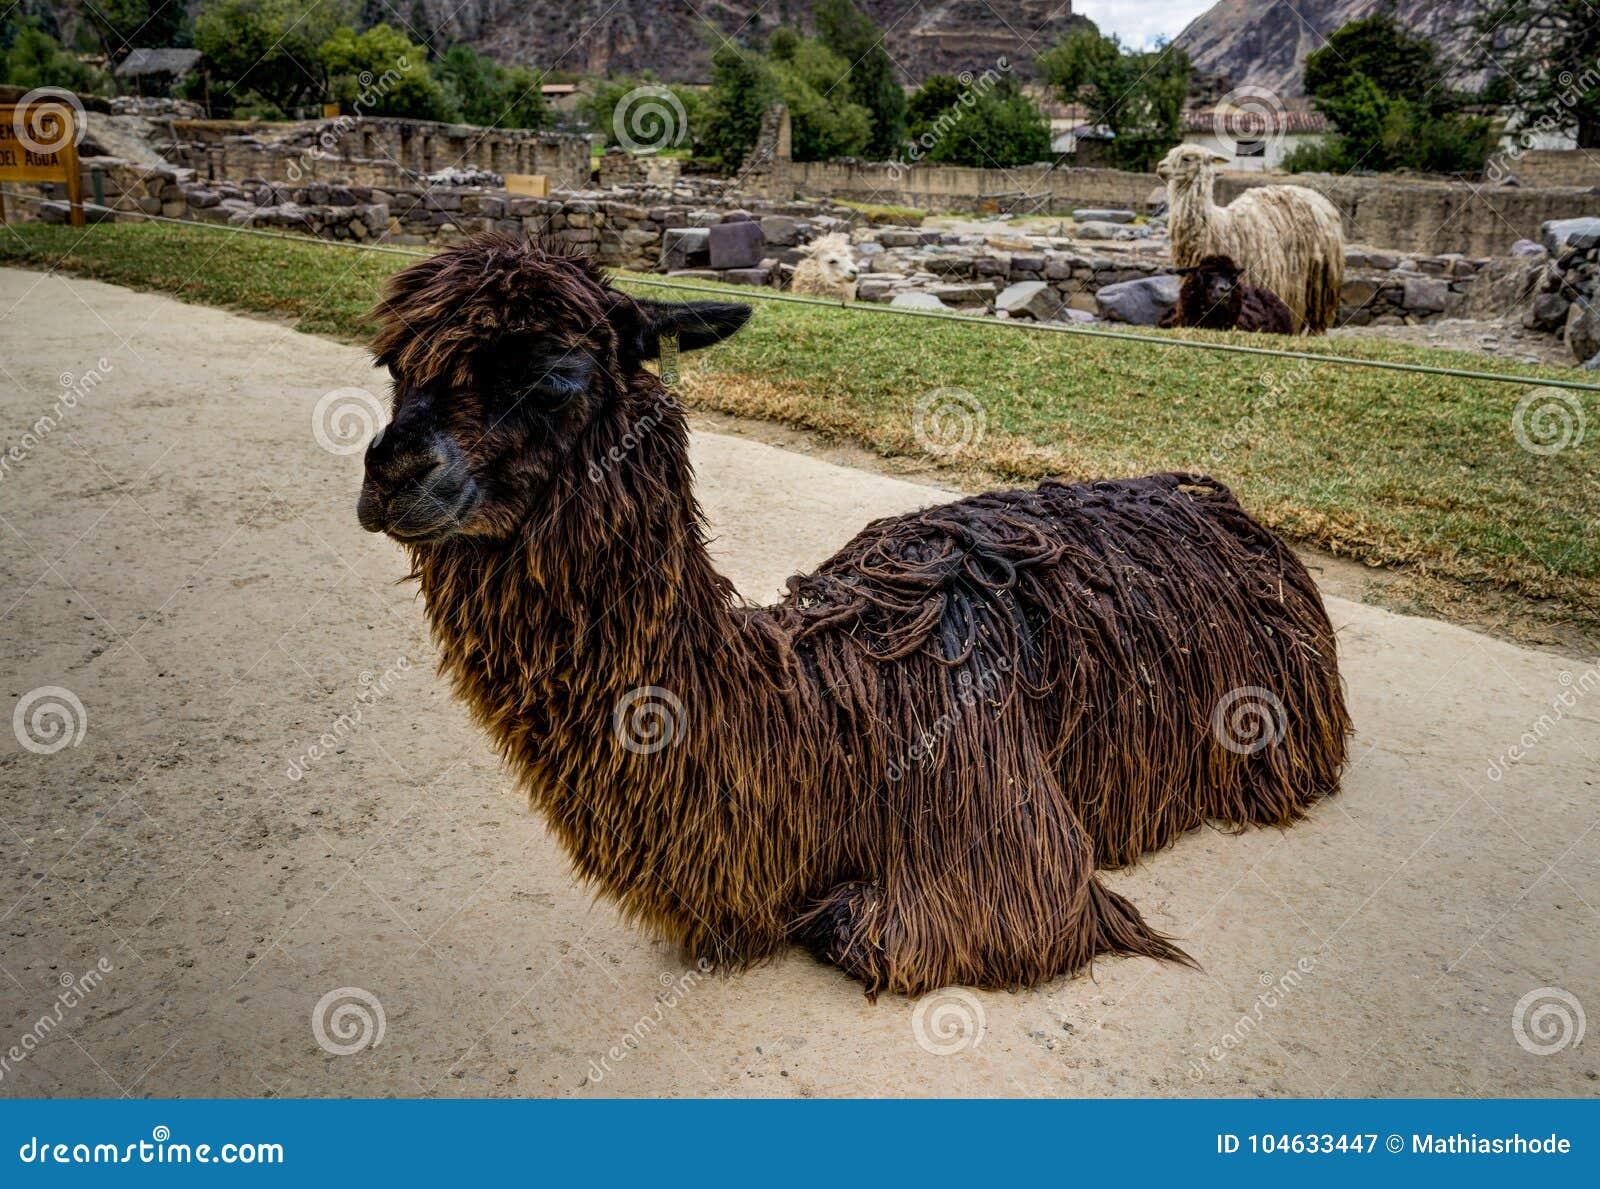 Download Alpaca In Ollantaytambo Peru Stock Afbeelding - Afbeelding bestaande uit platteland, cultuur: 104633447